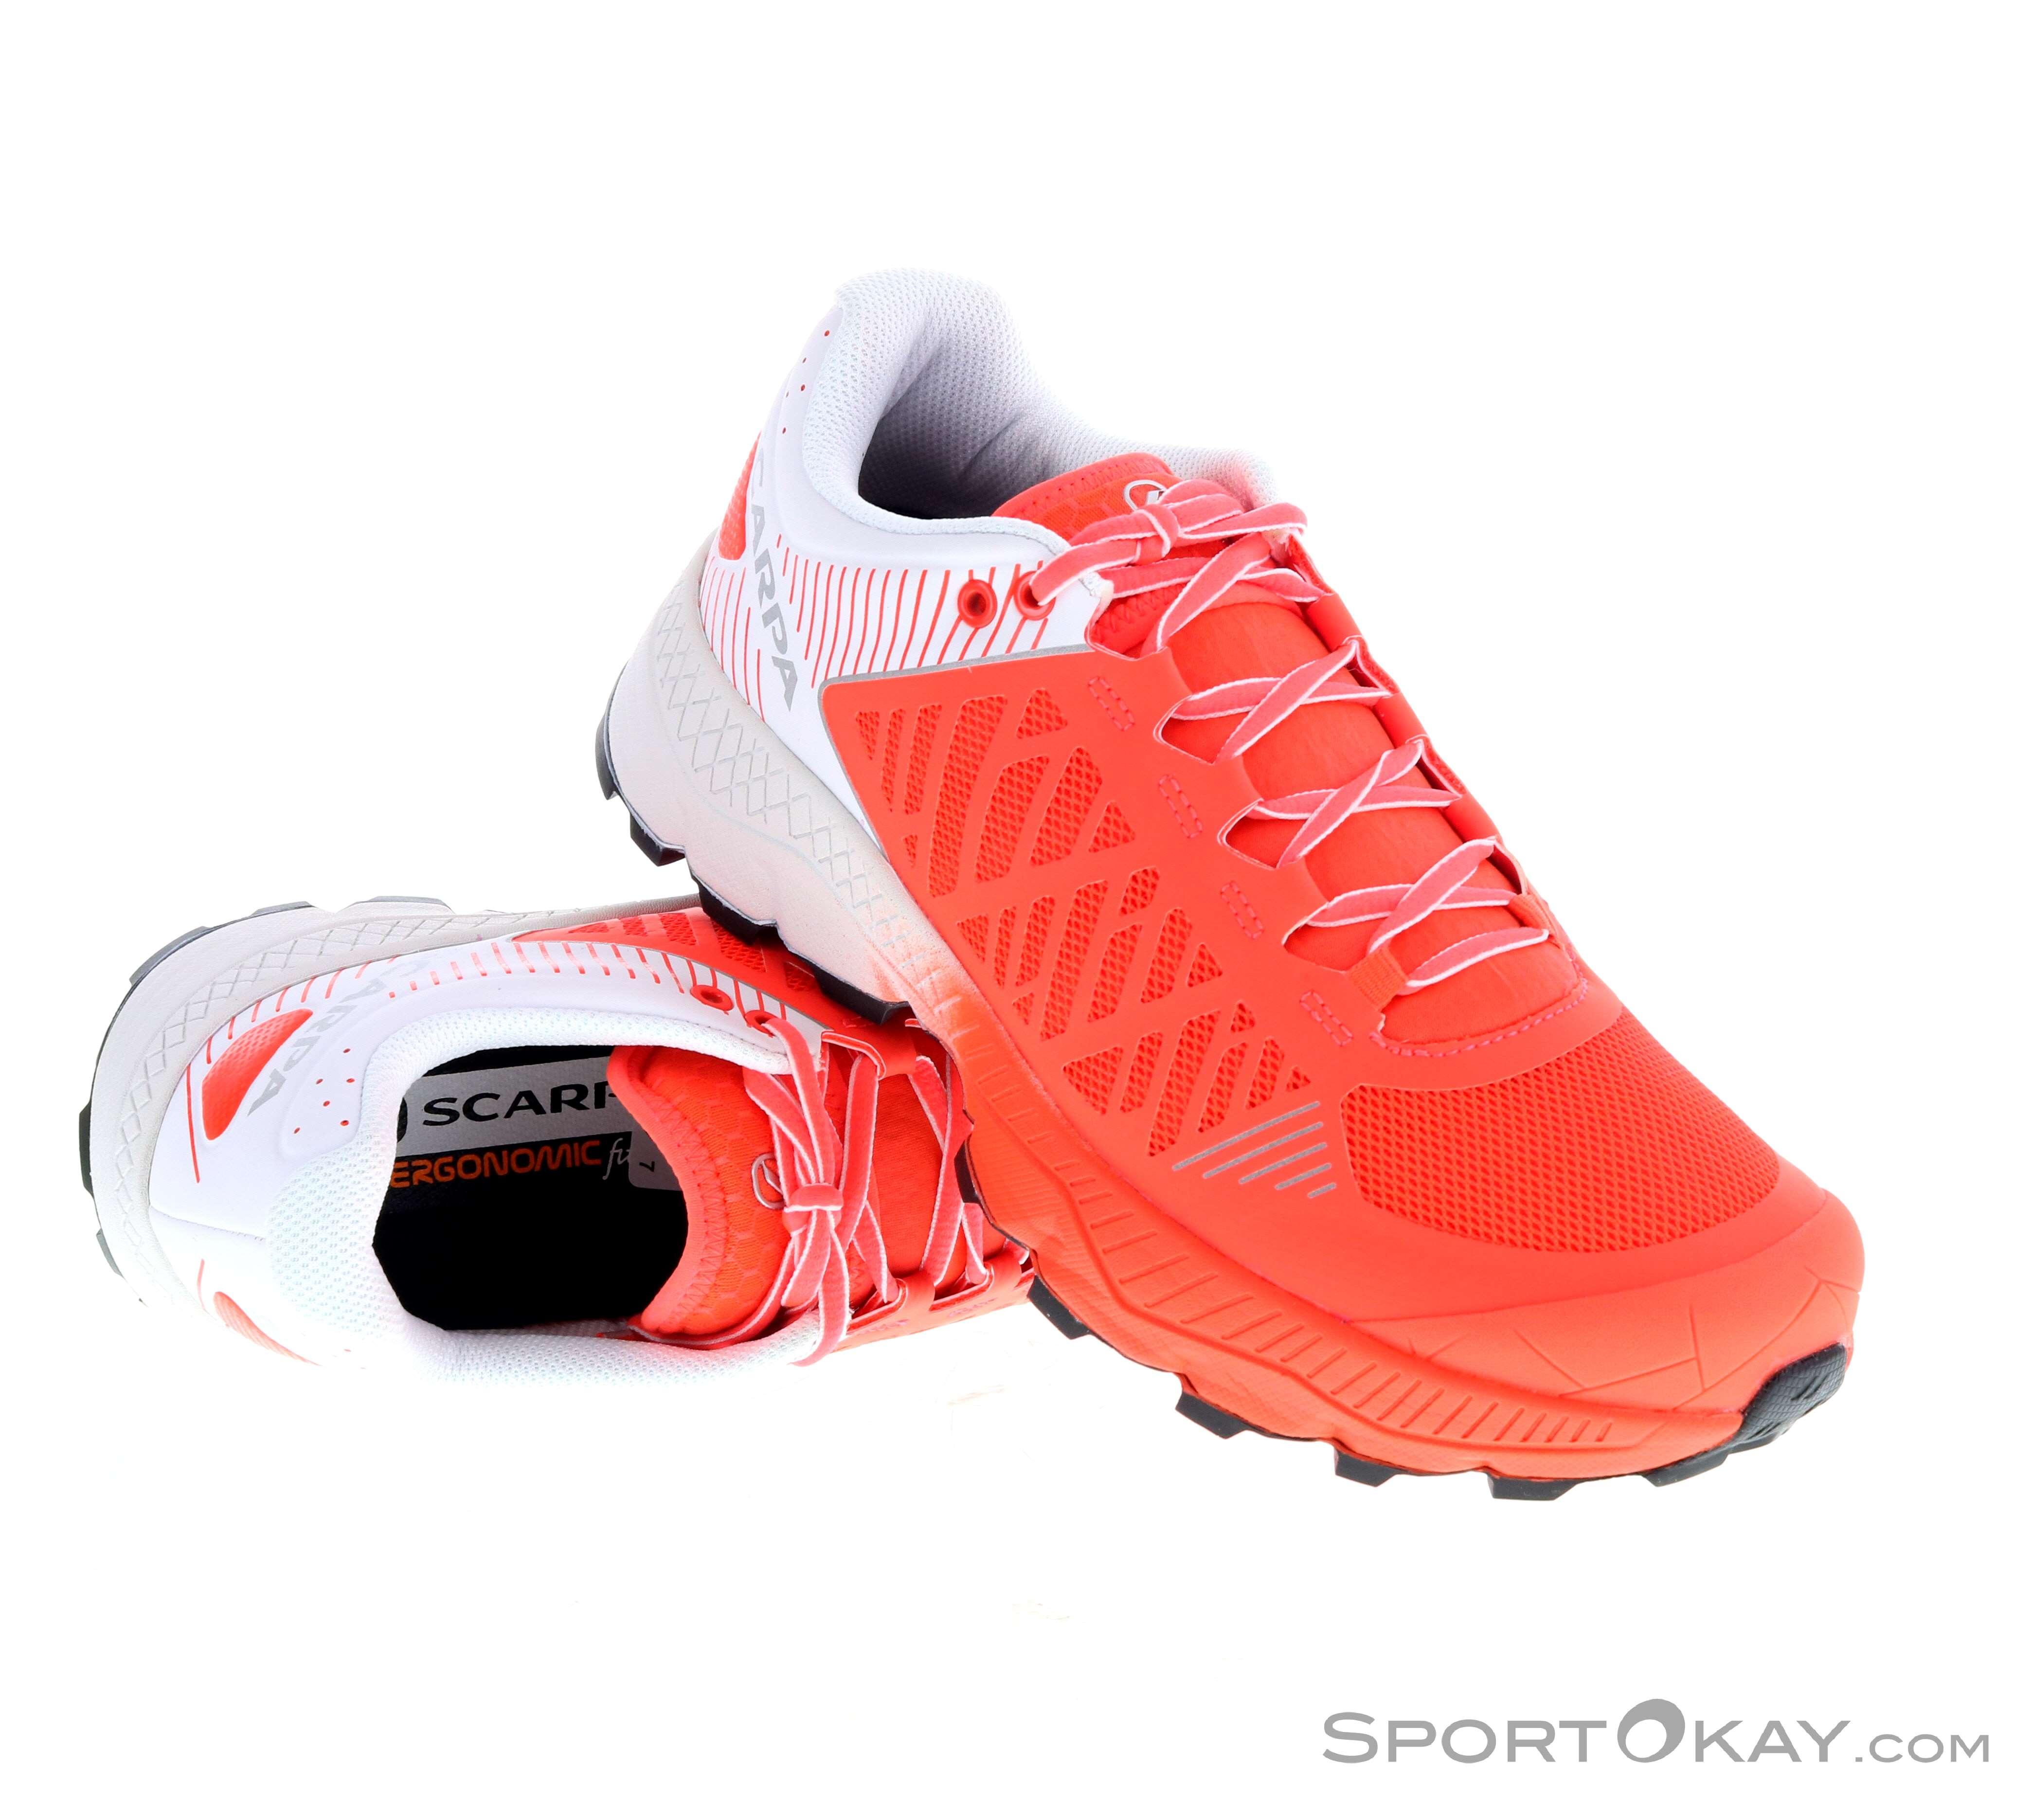 scarpa spin ultra